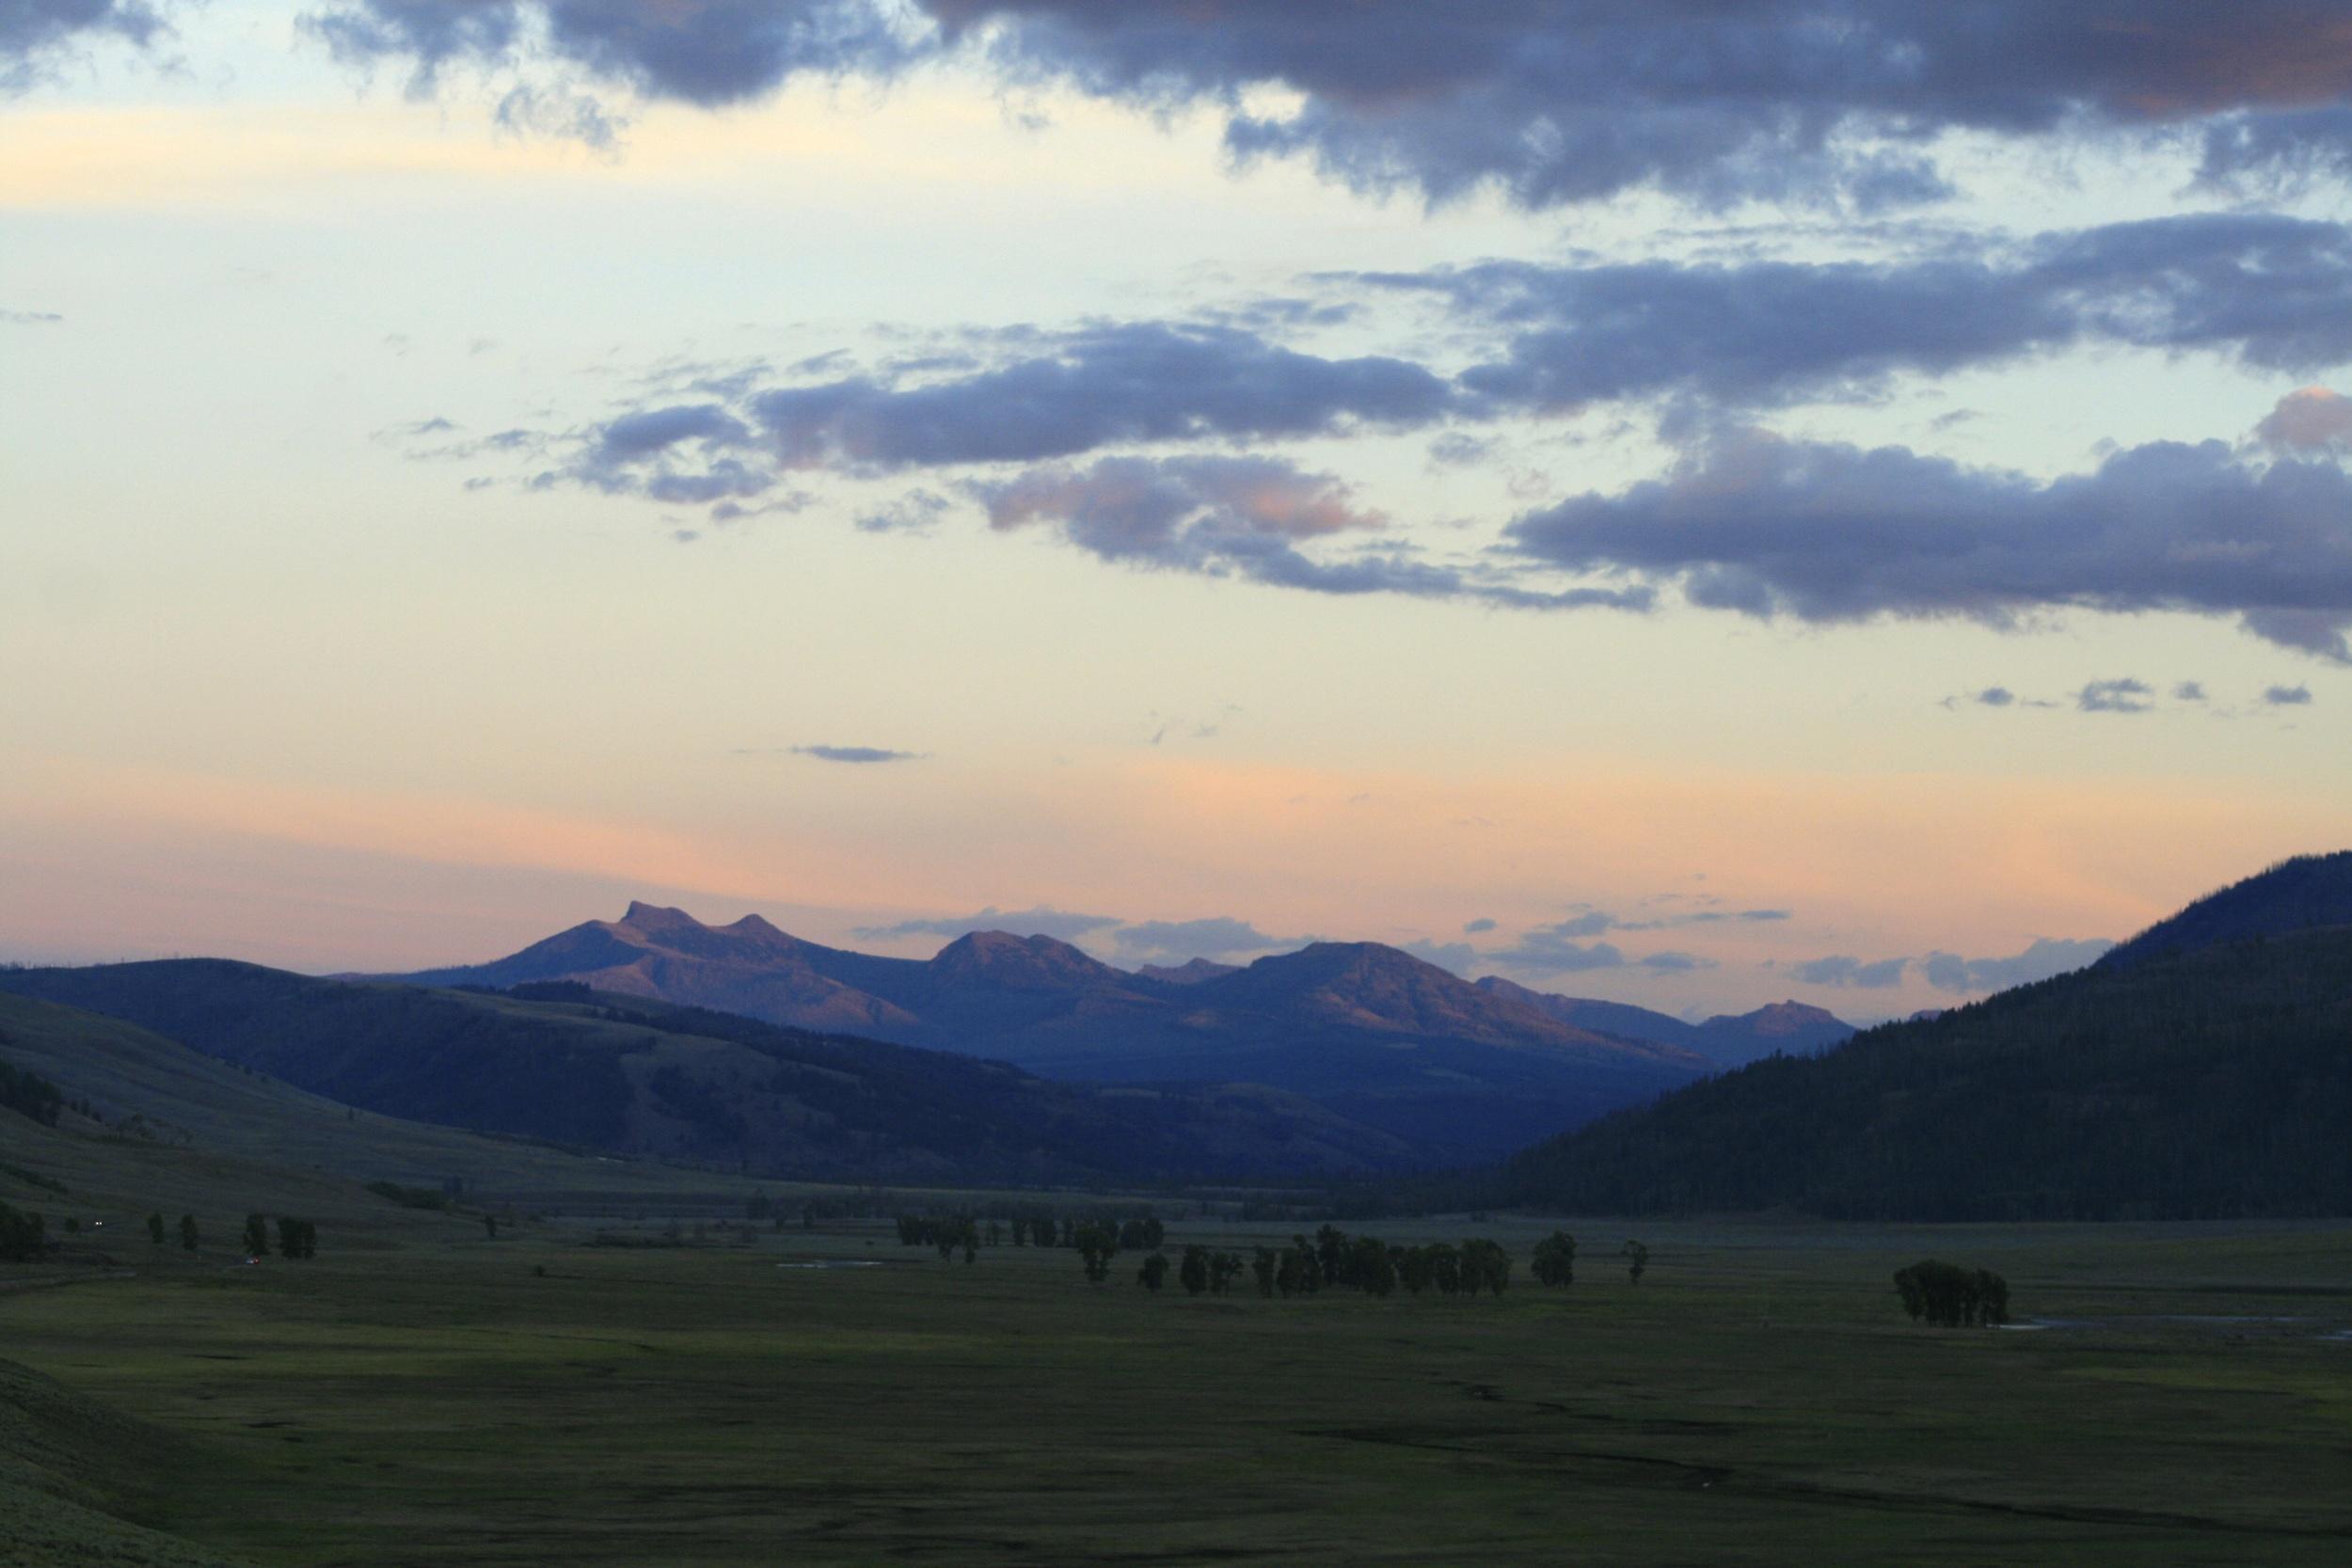 Lamar Valley at sunset